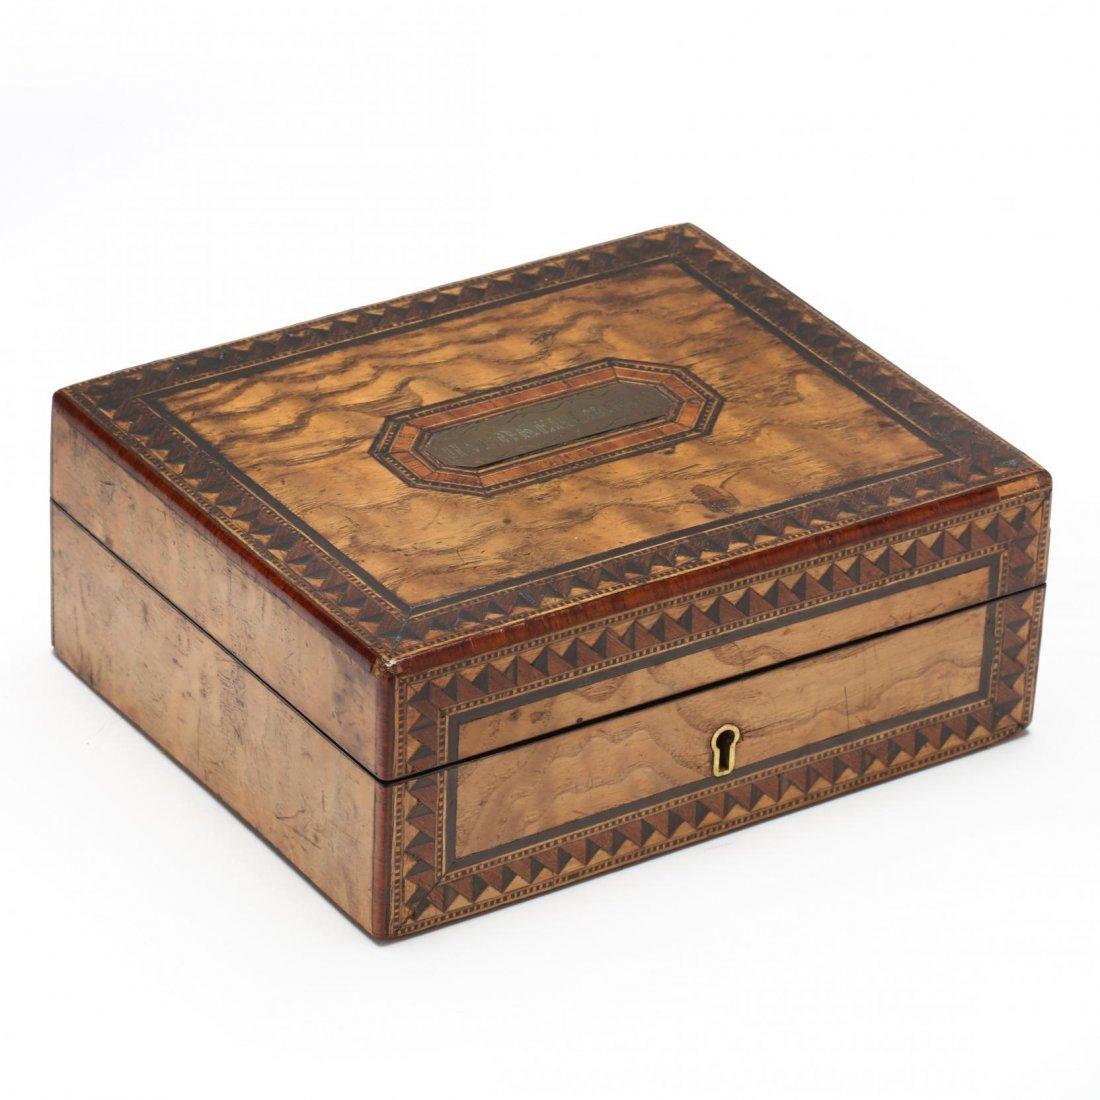 Antique Marquetry Inlaid Handkerchief Box